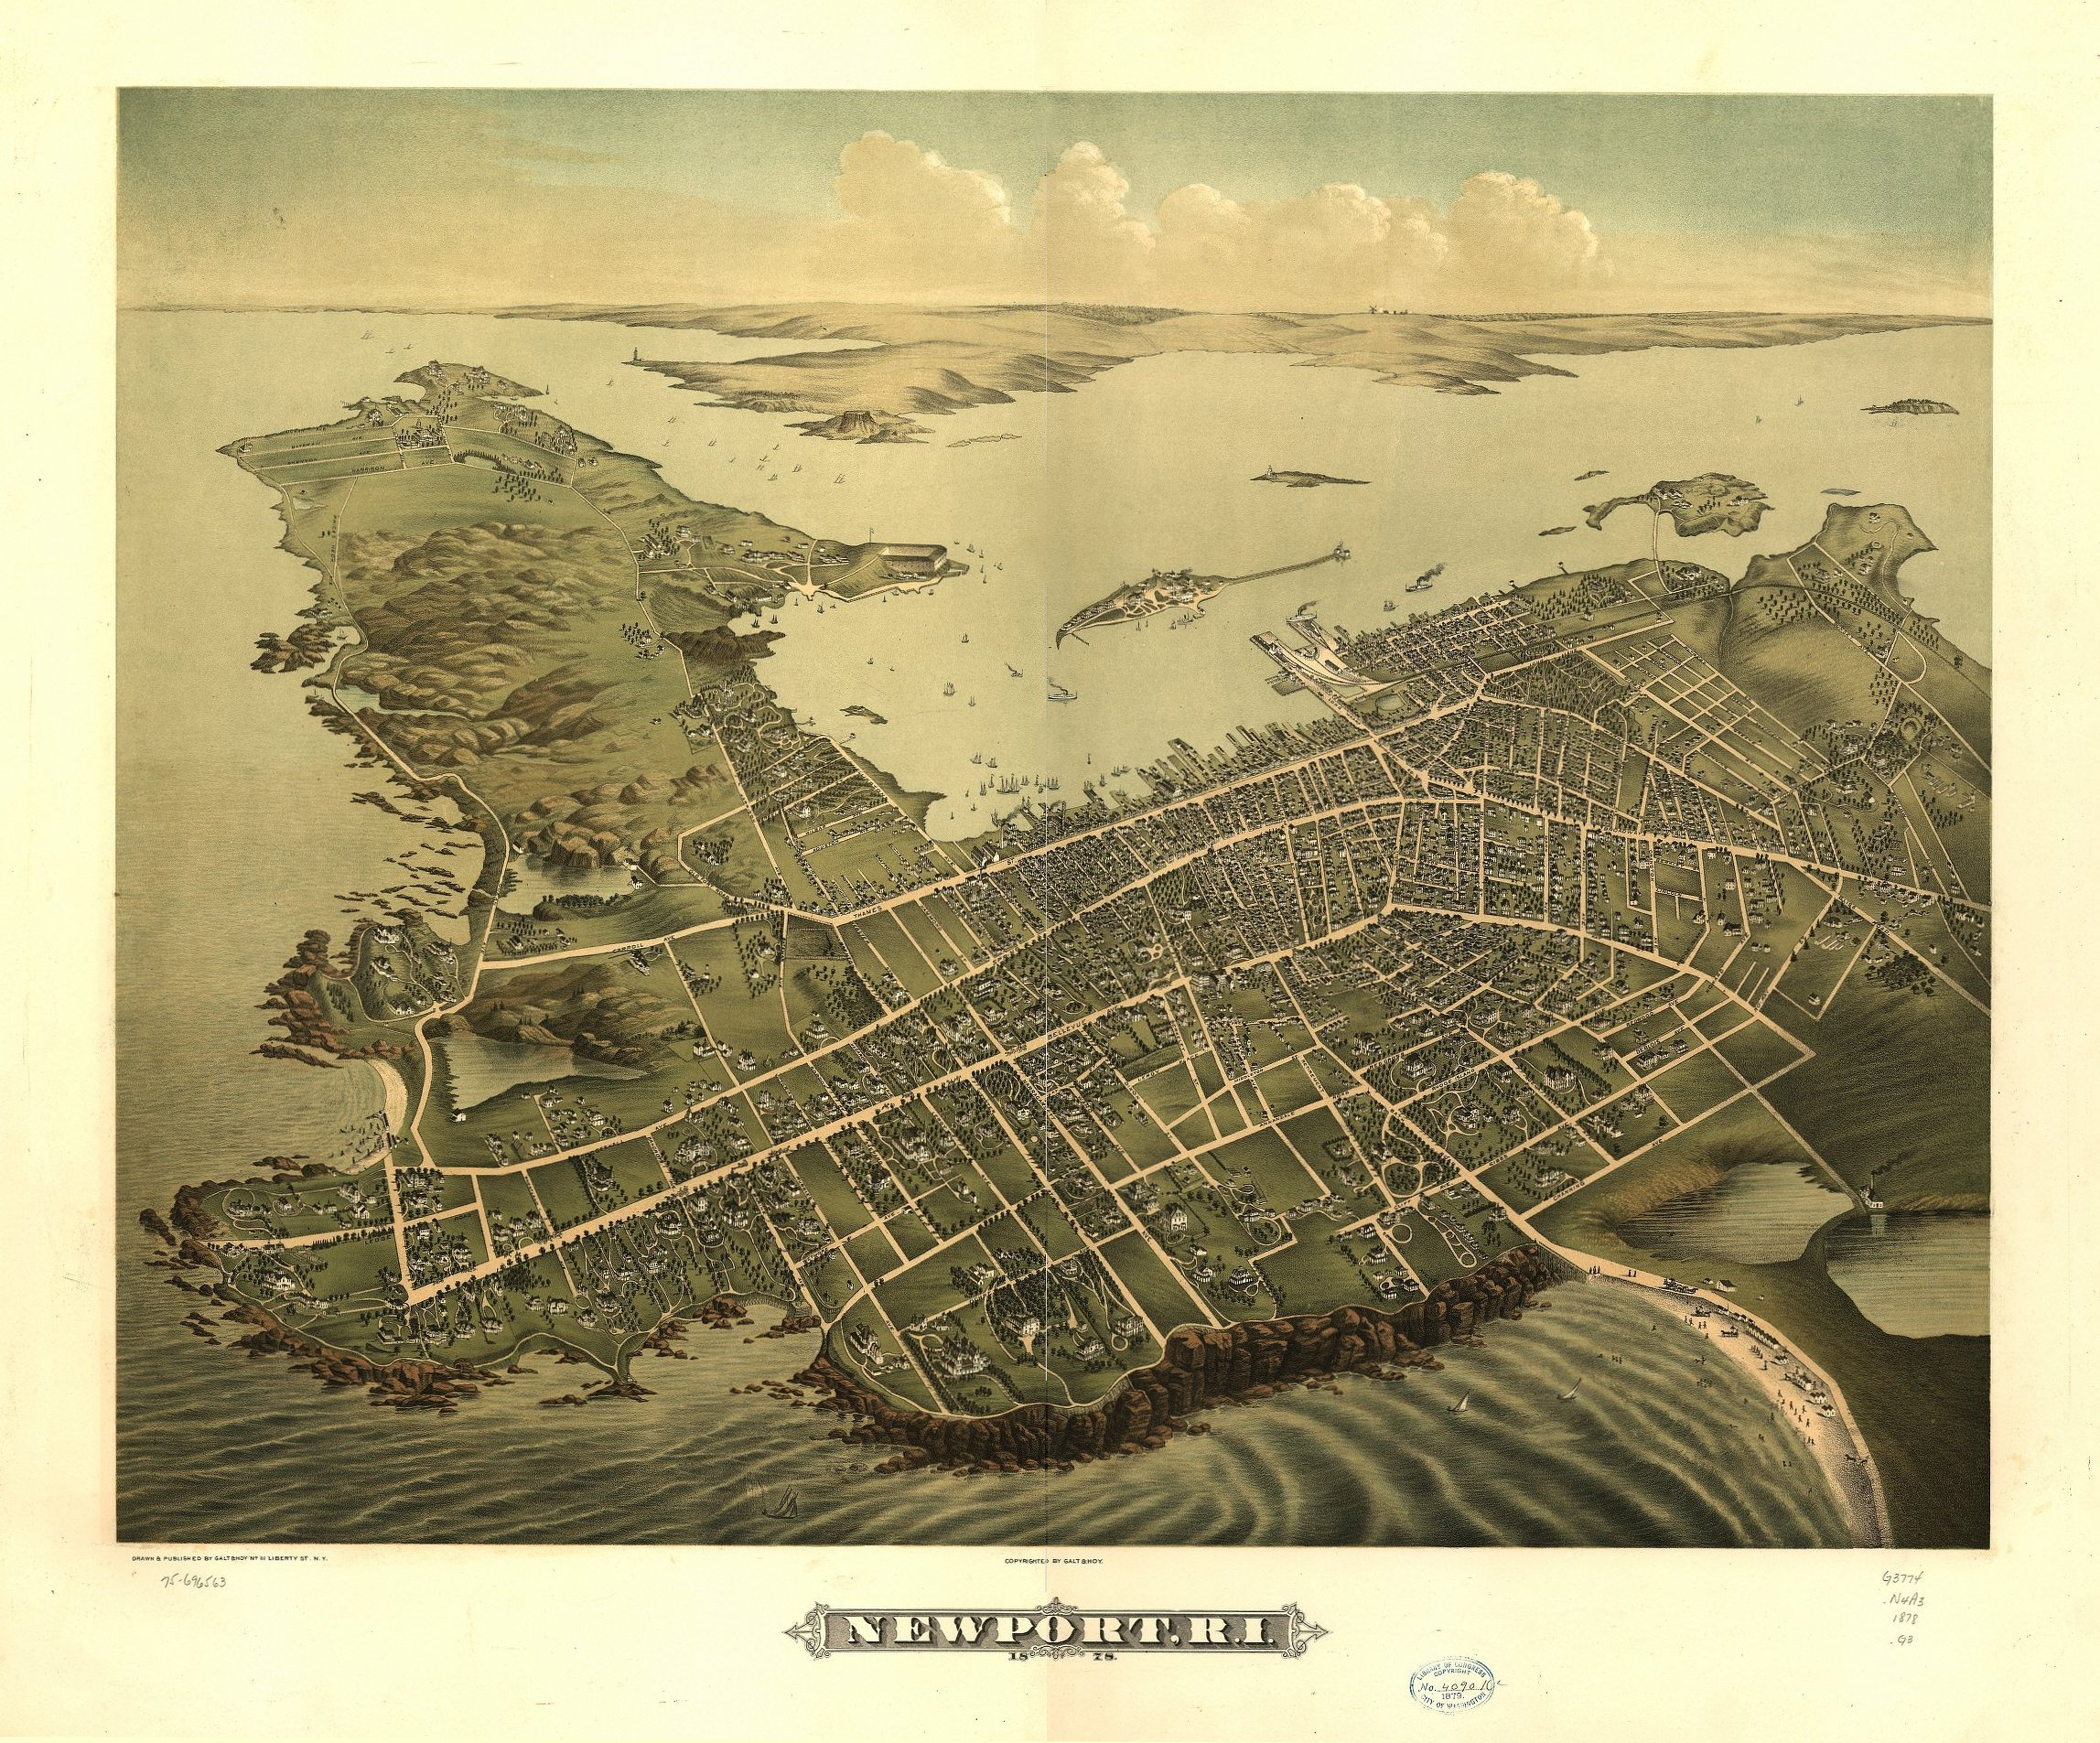 Rhode Island Maps Rhode Island Digital Map Library Table Of - Rhode island in usa map